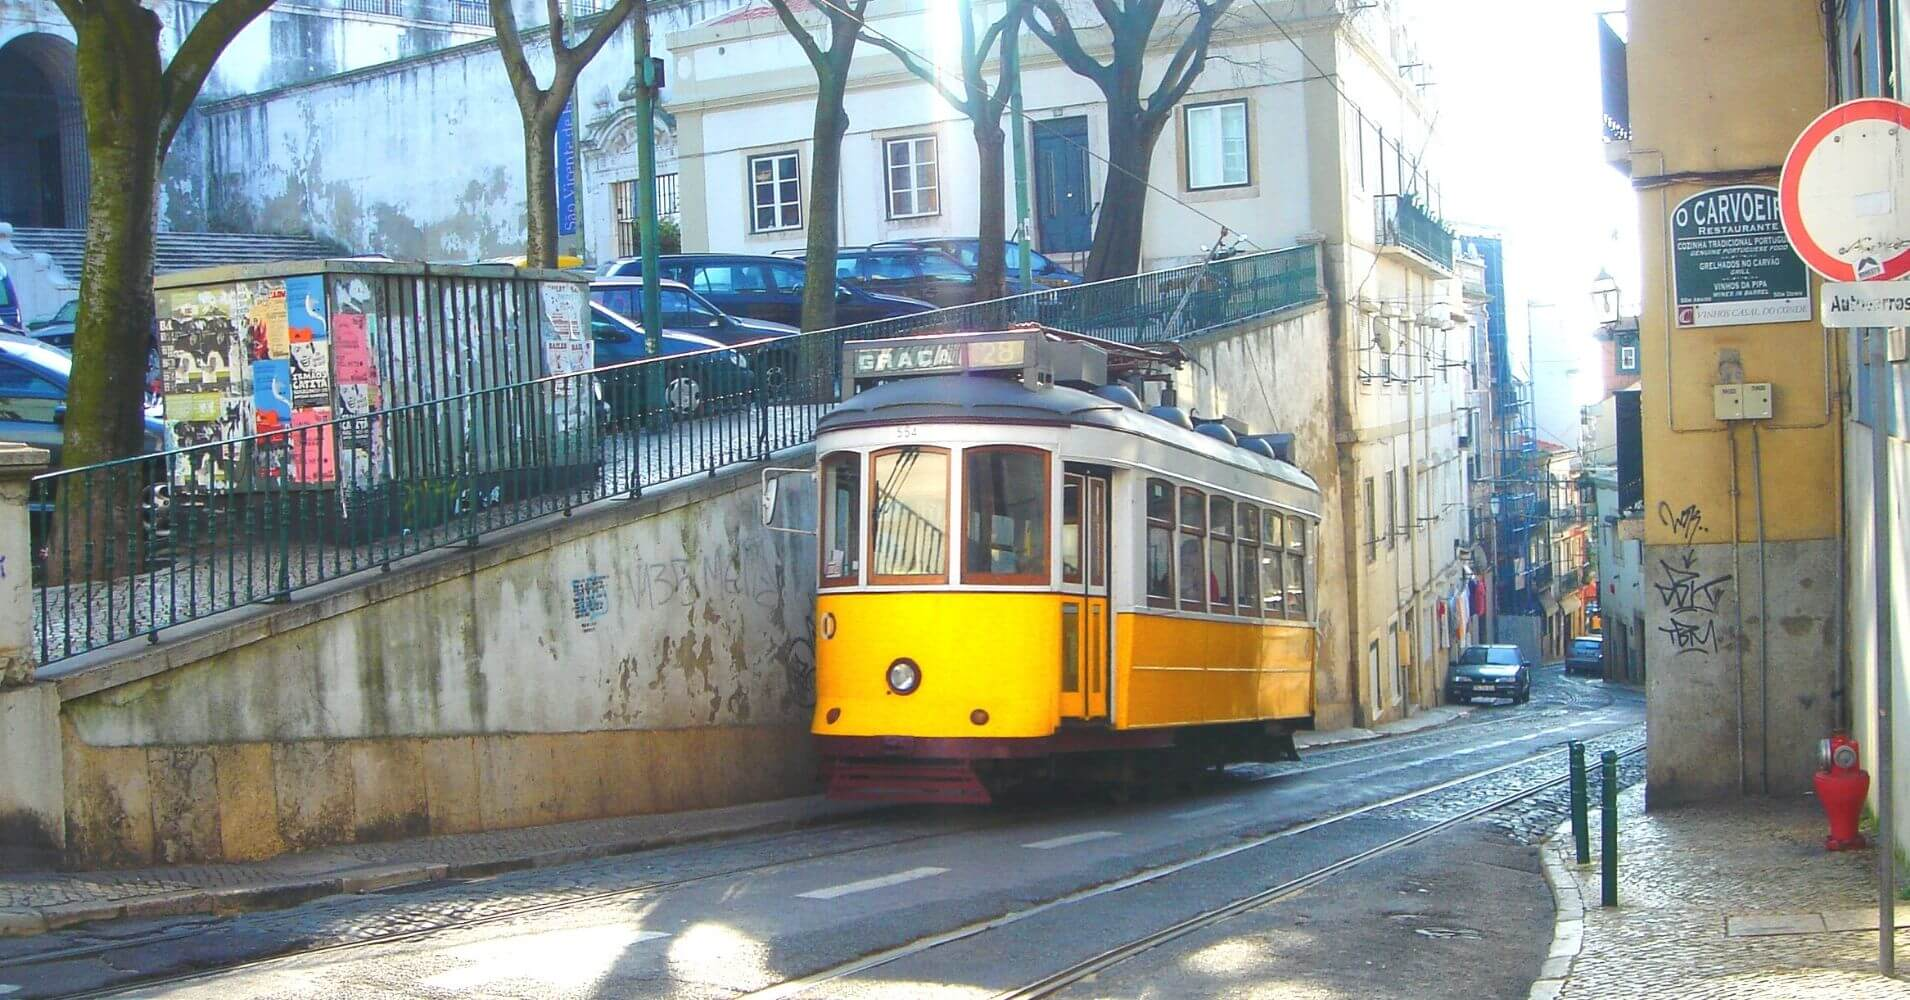 Tranvía Barrio de Chiado. Lisboa, Portugal.